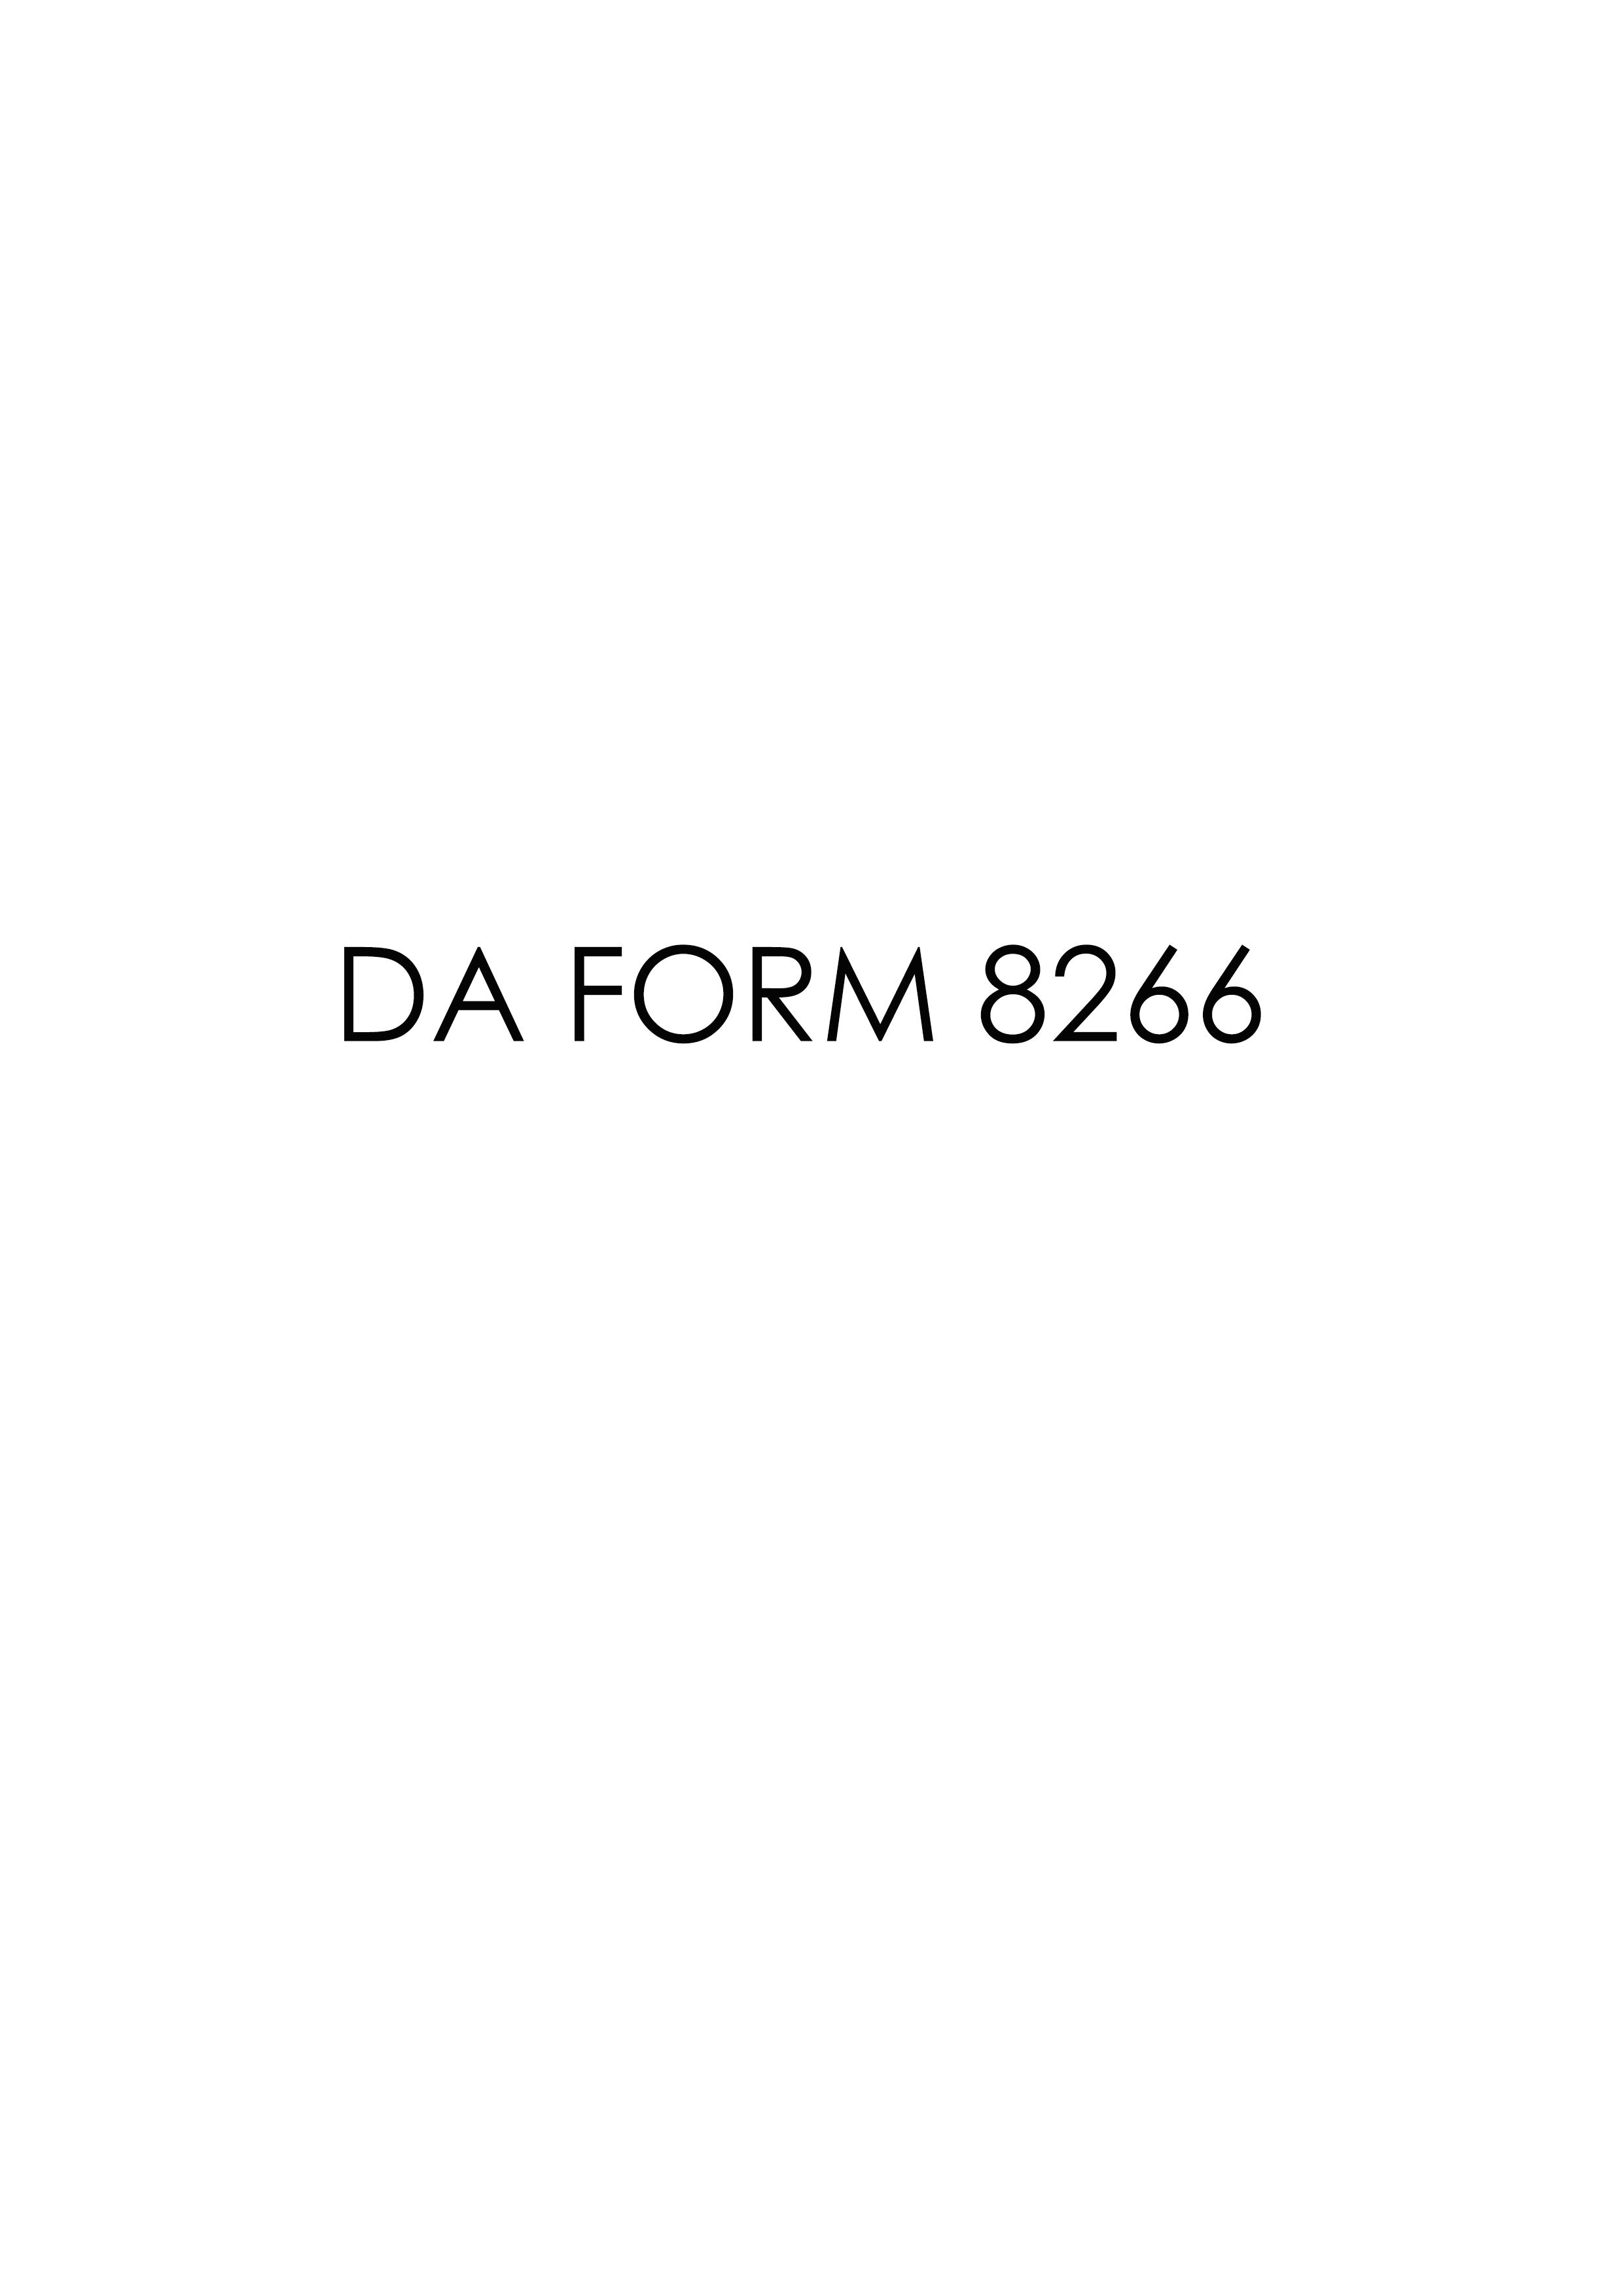 Download da Form 8266 Free